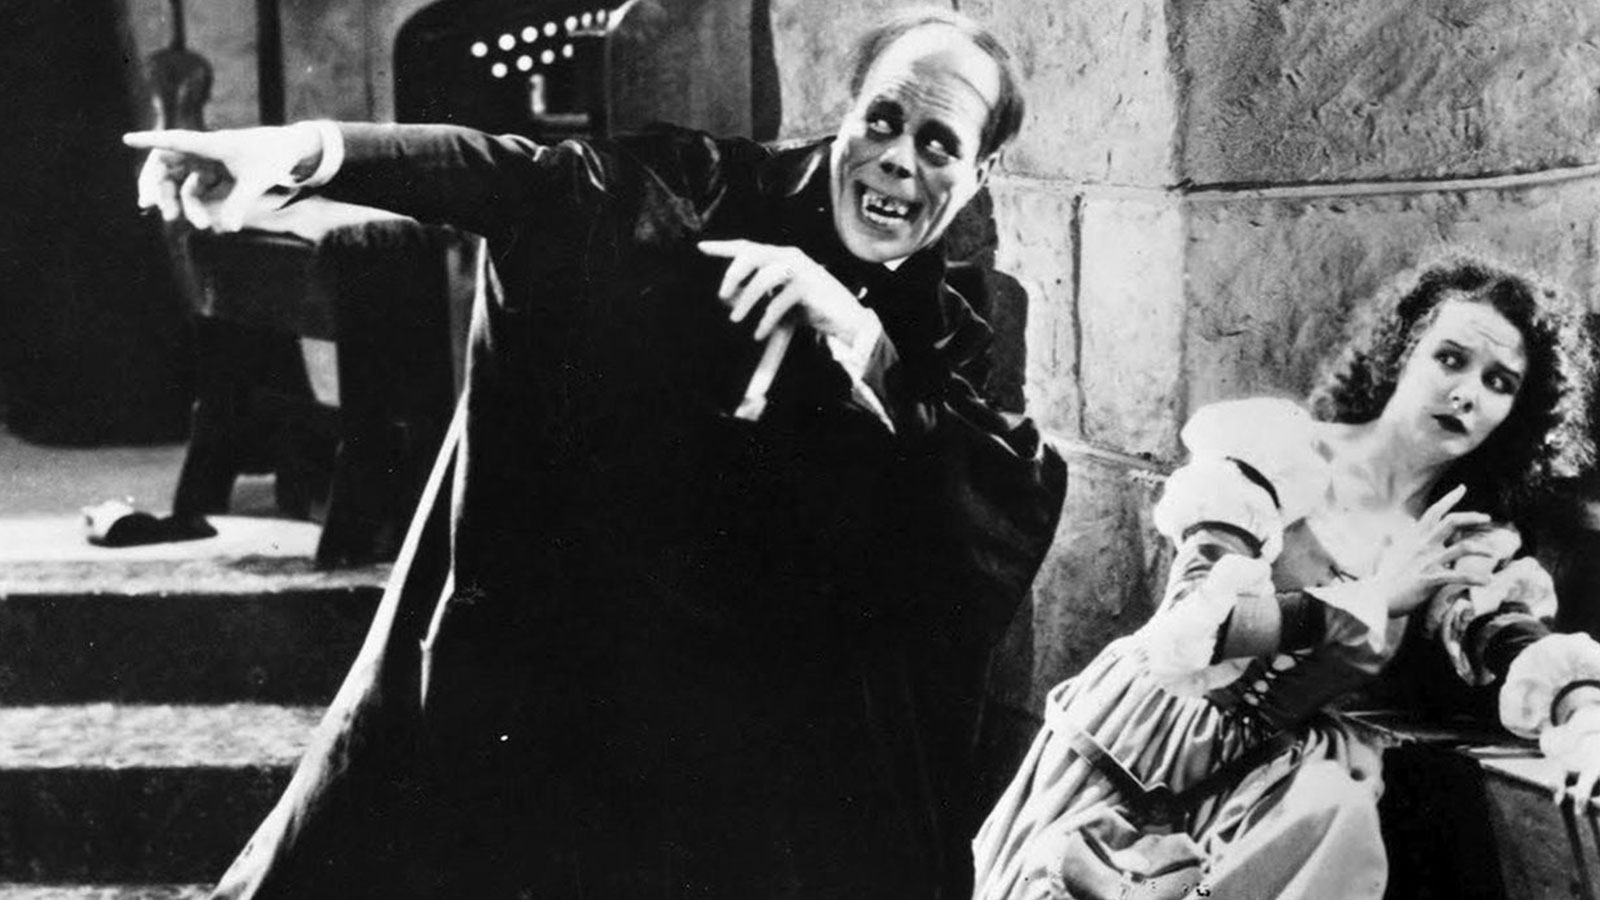 1. The Phantom of the Opera